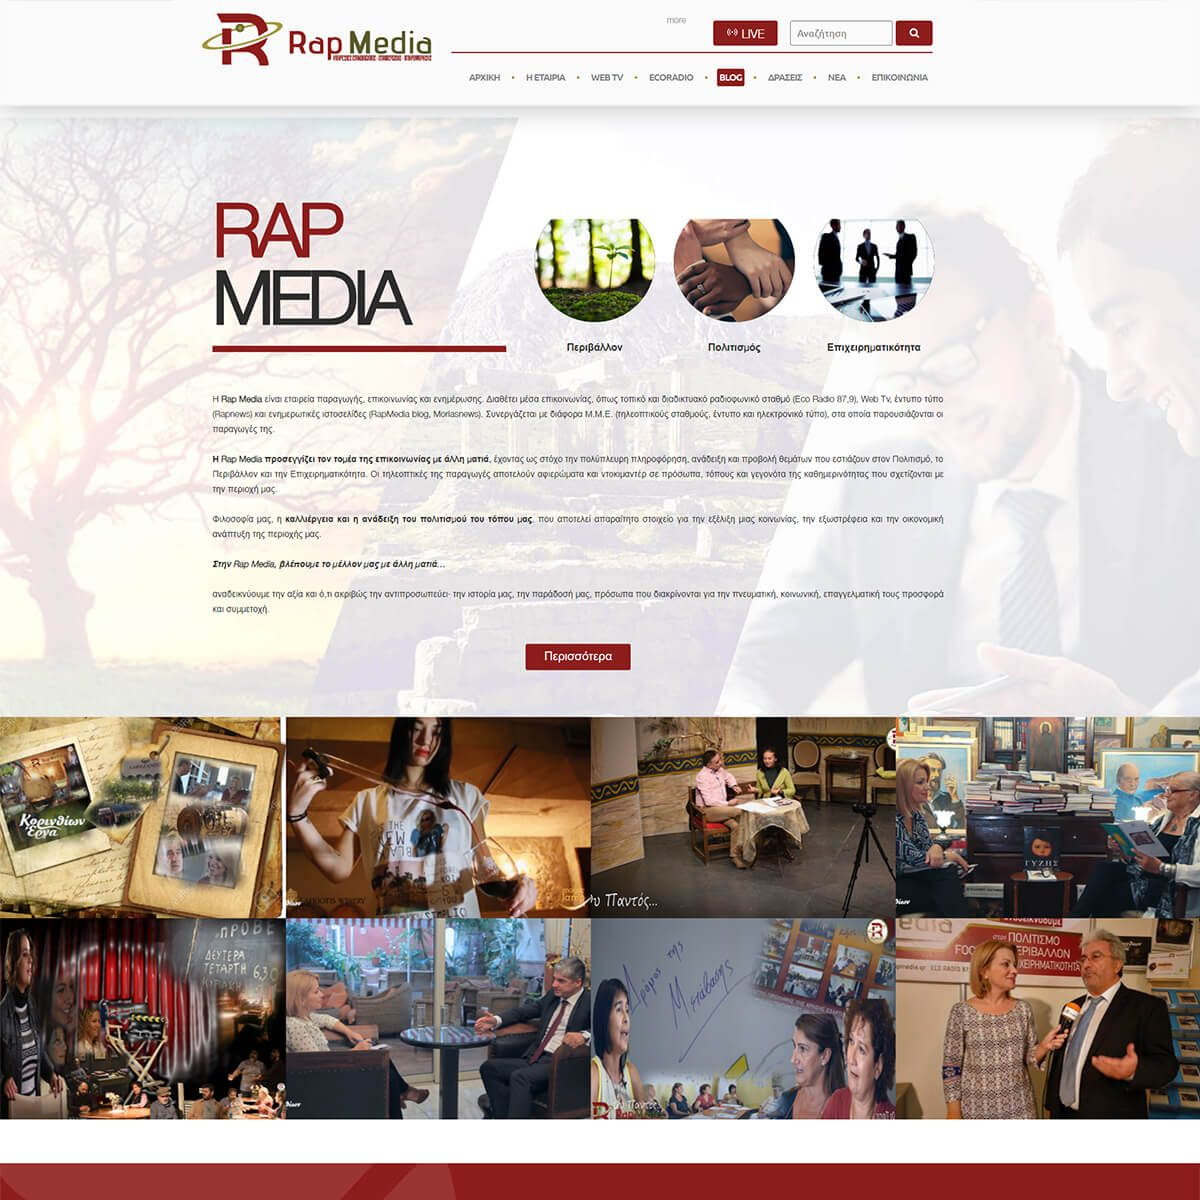 RapMedia